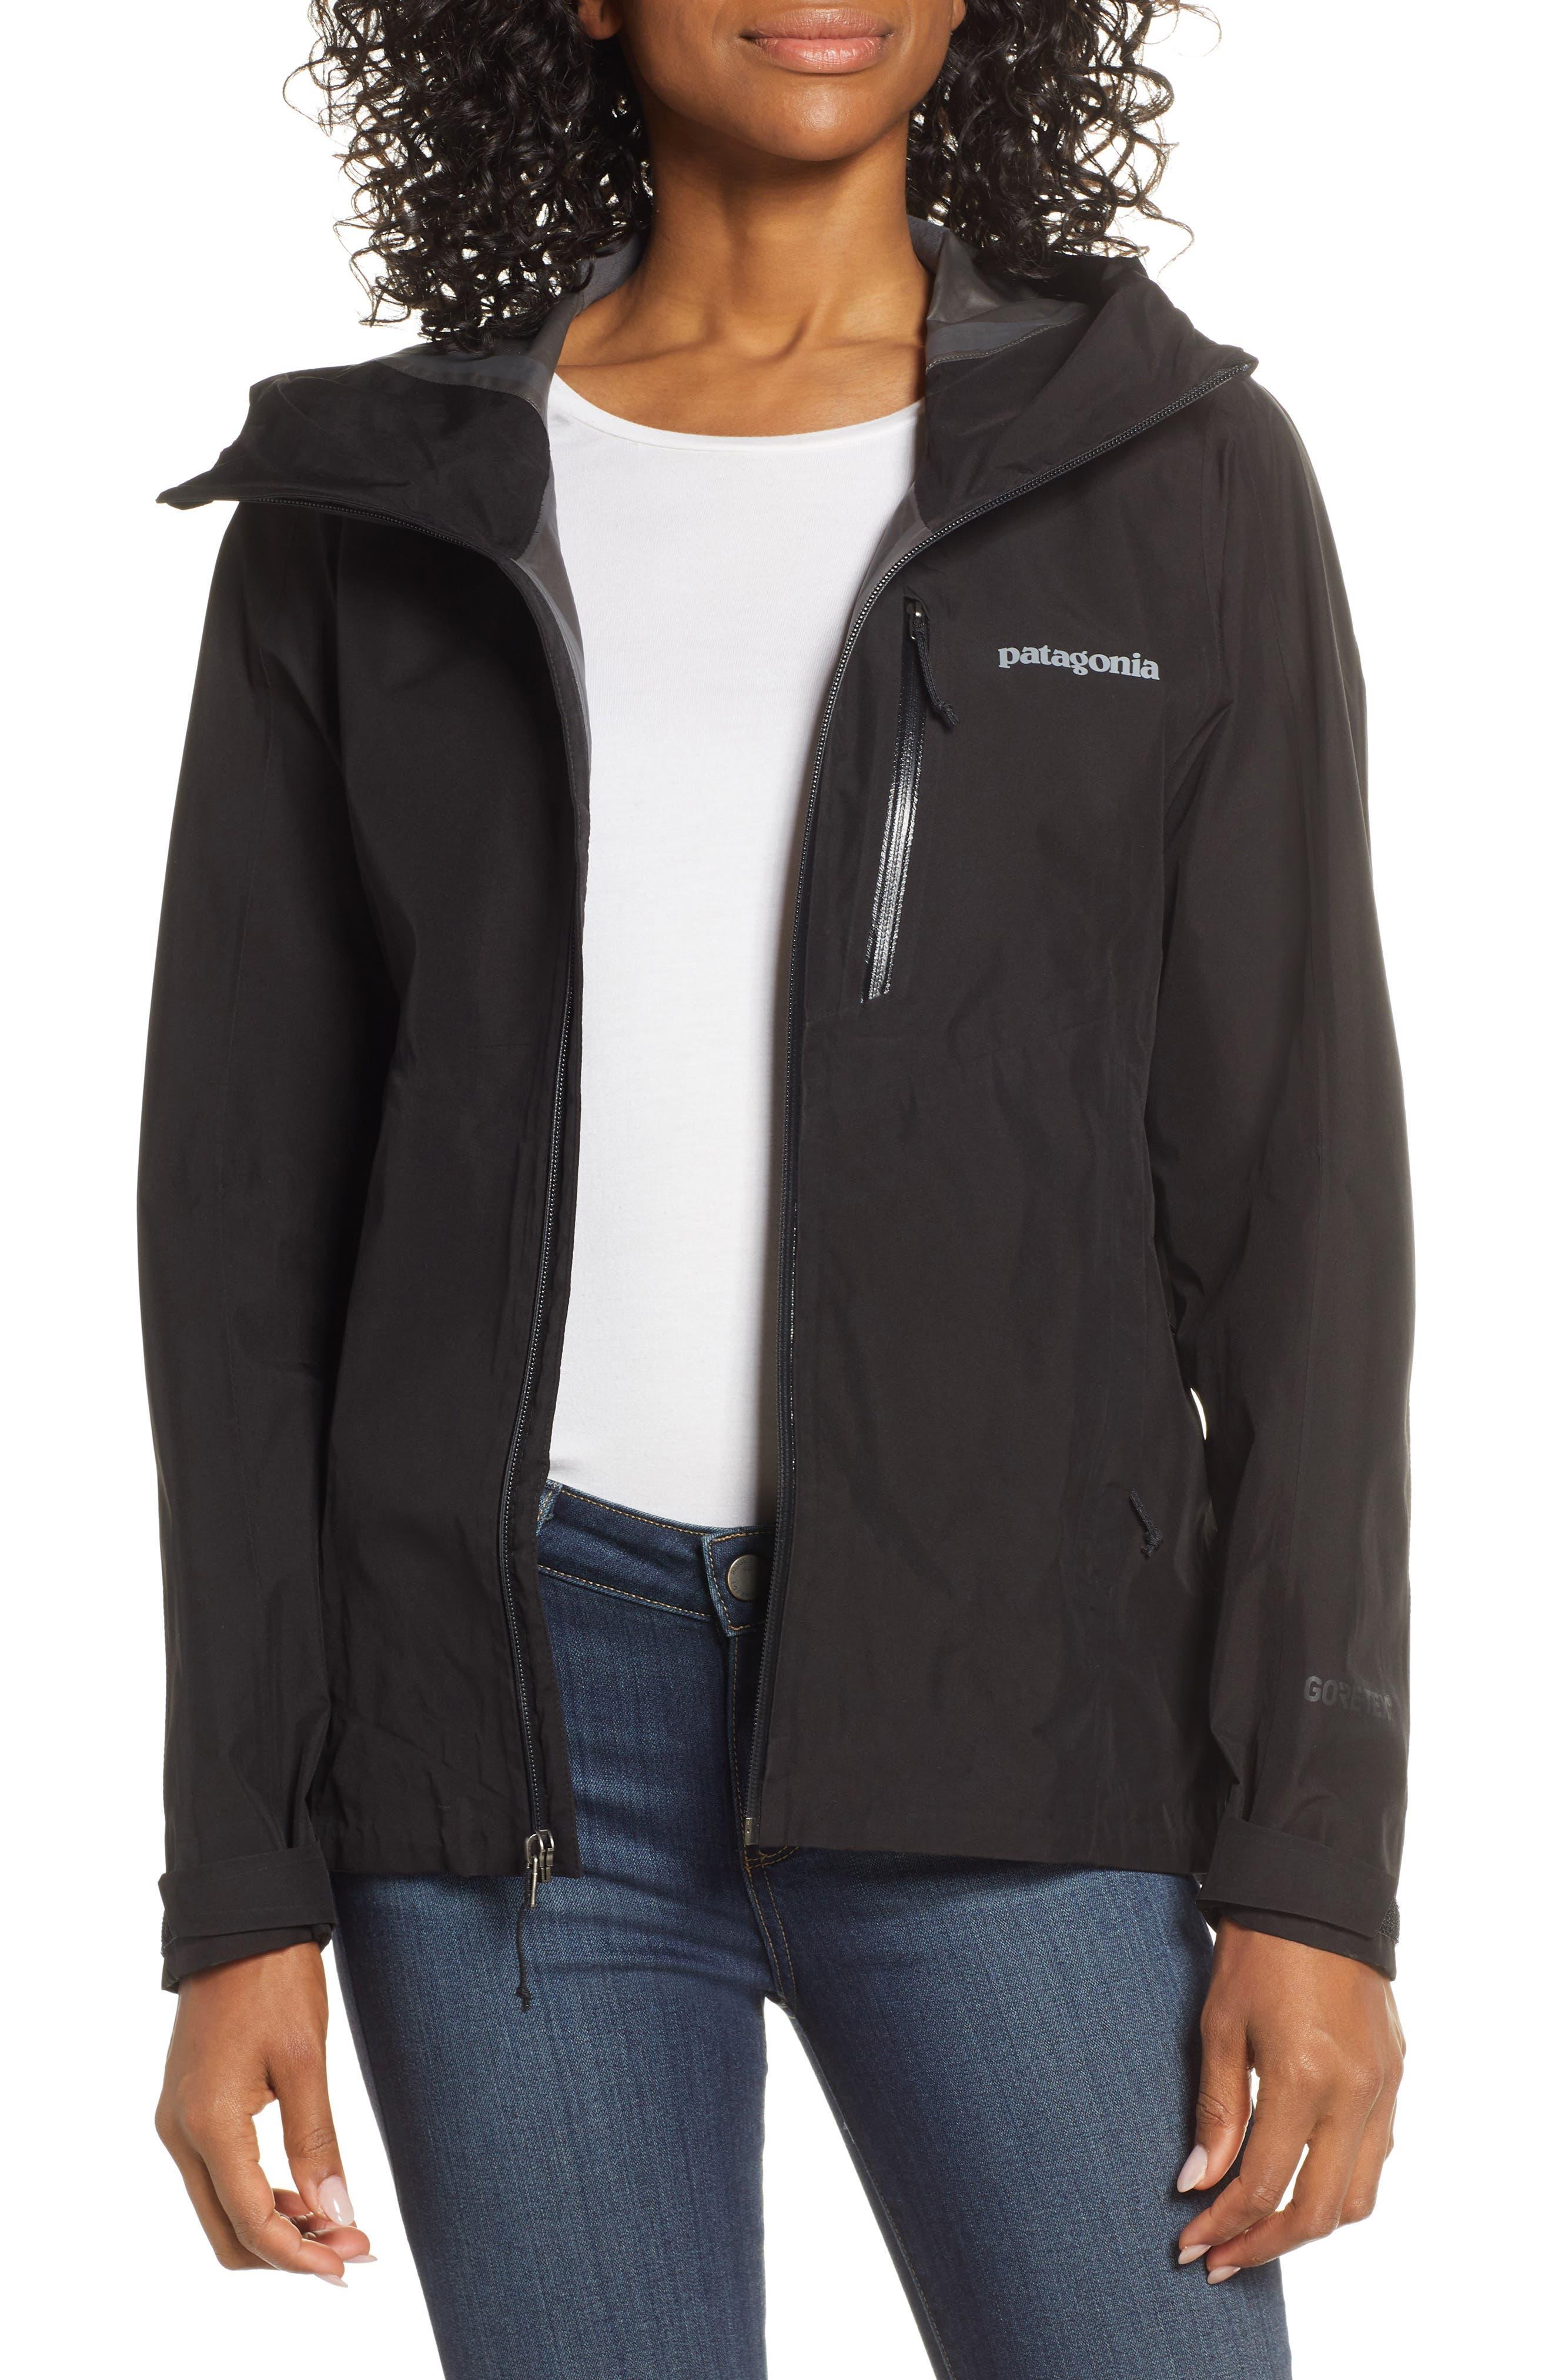 Patagonia Calcite Hooded Jacket, Black